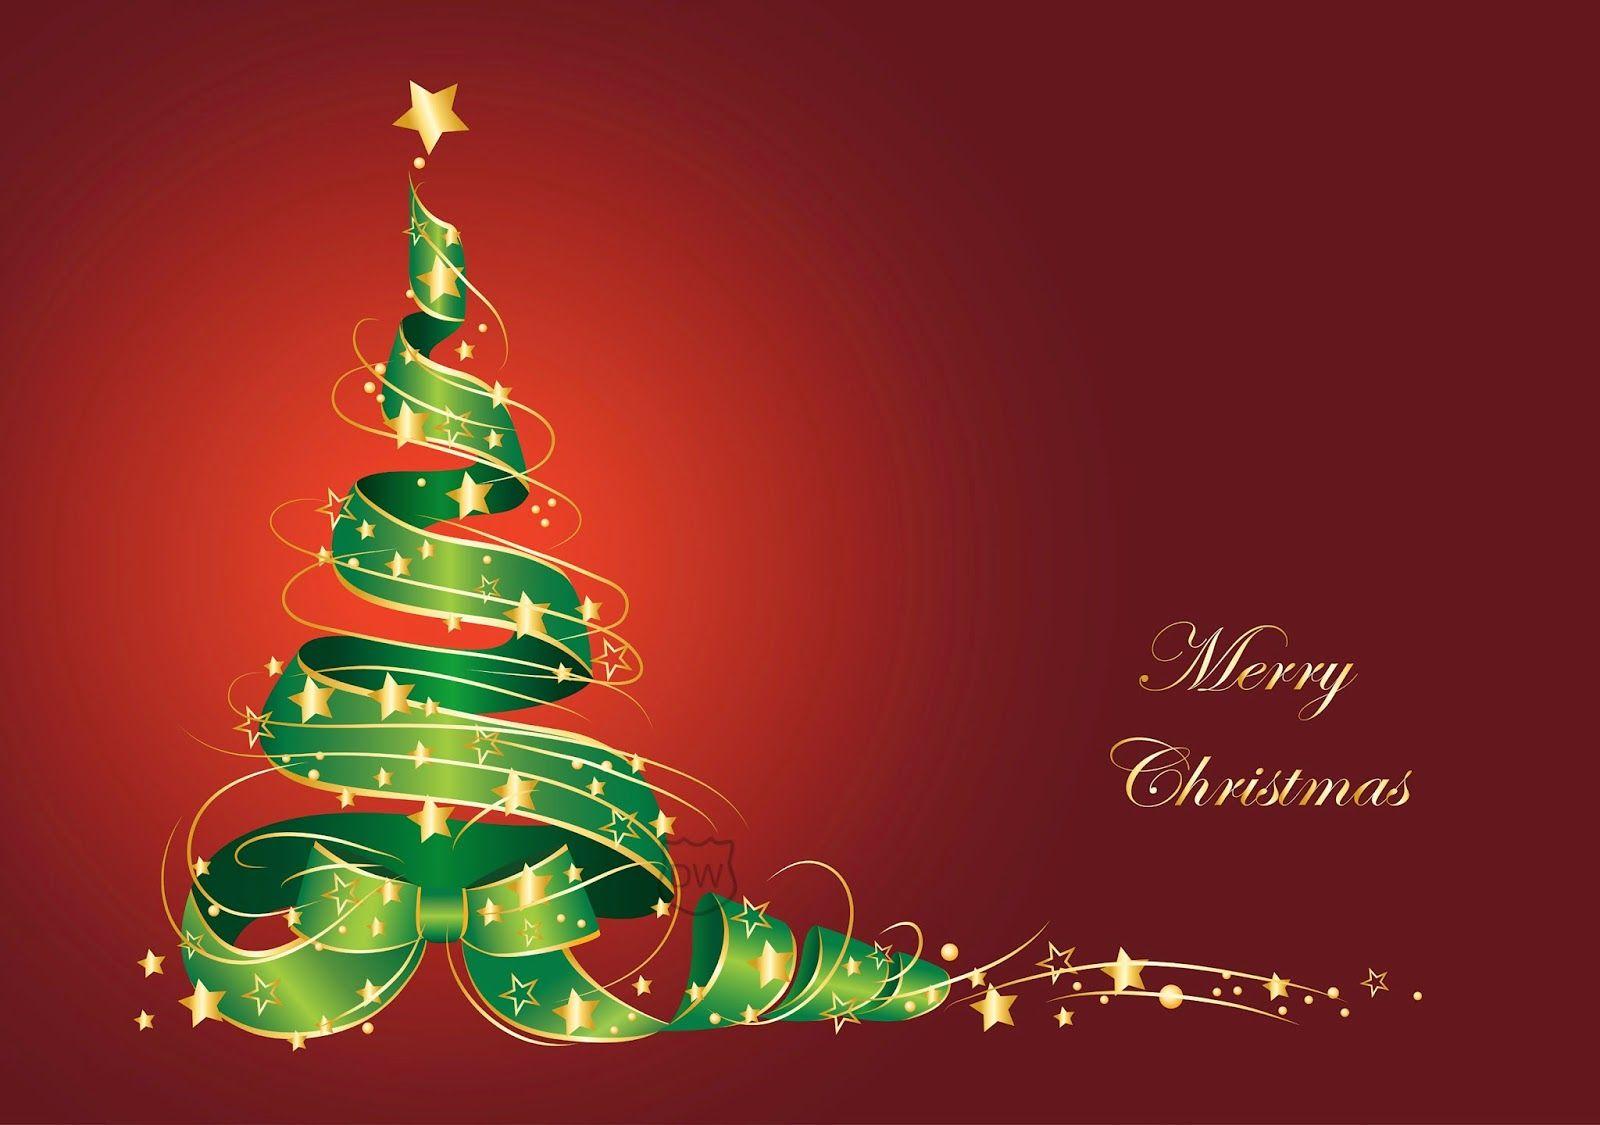 Merry Christmas 2016 Wallpaper Christmas Wallpaper Hd Merry Christmas Wallpaper Merry Christmas Funny Hd wallpaper christmas tree gifts boxes